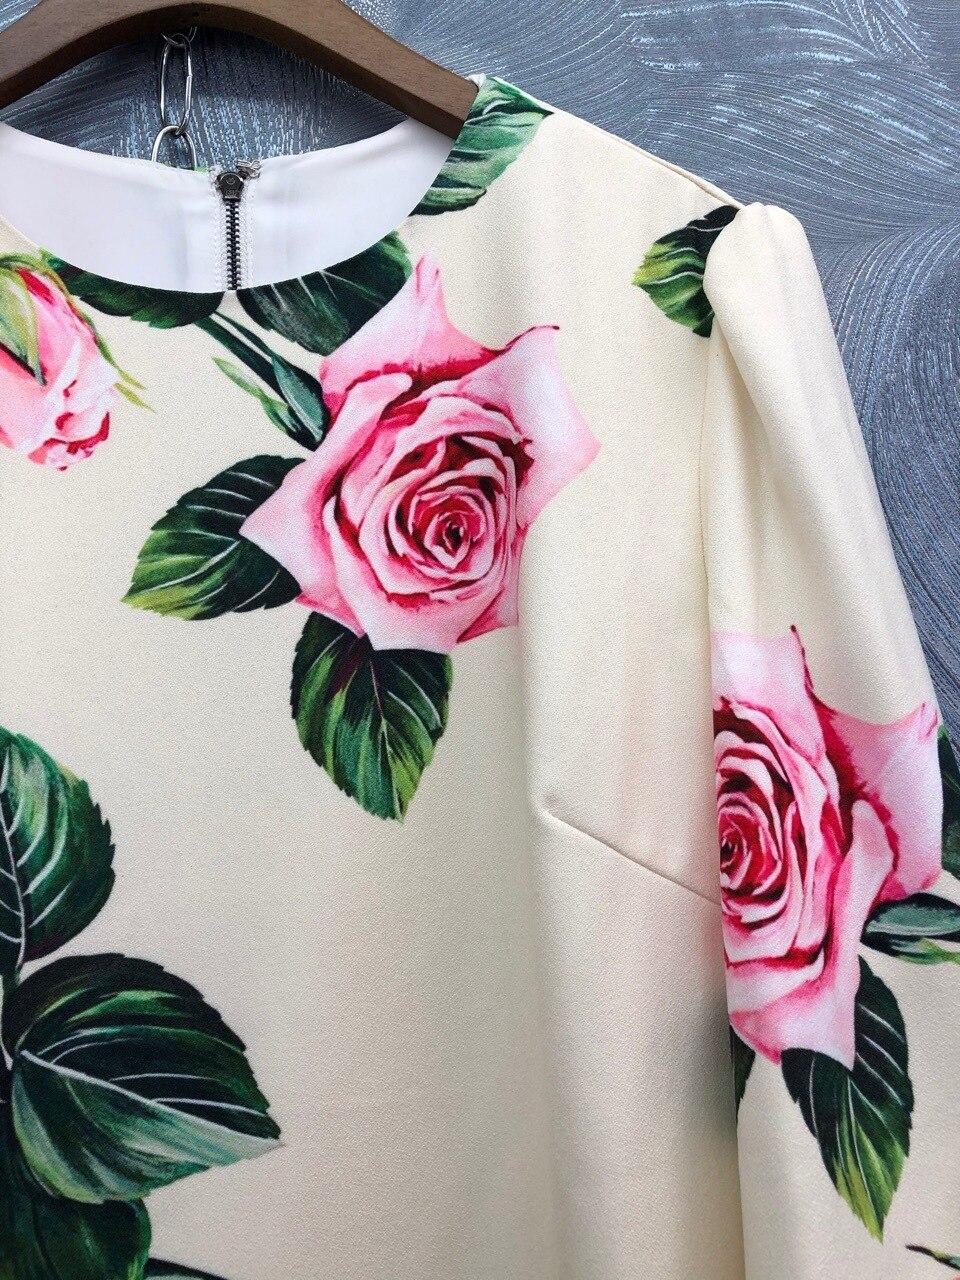 Spring summer runways floral print half sleeve sweet dress Fashion women's elegant dress B229 3